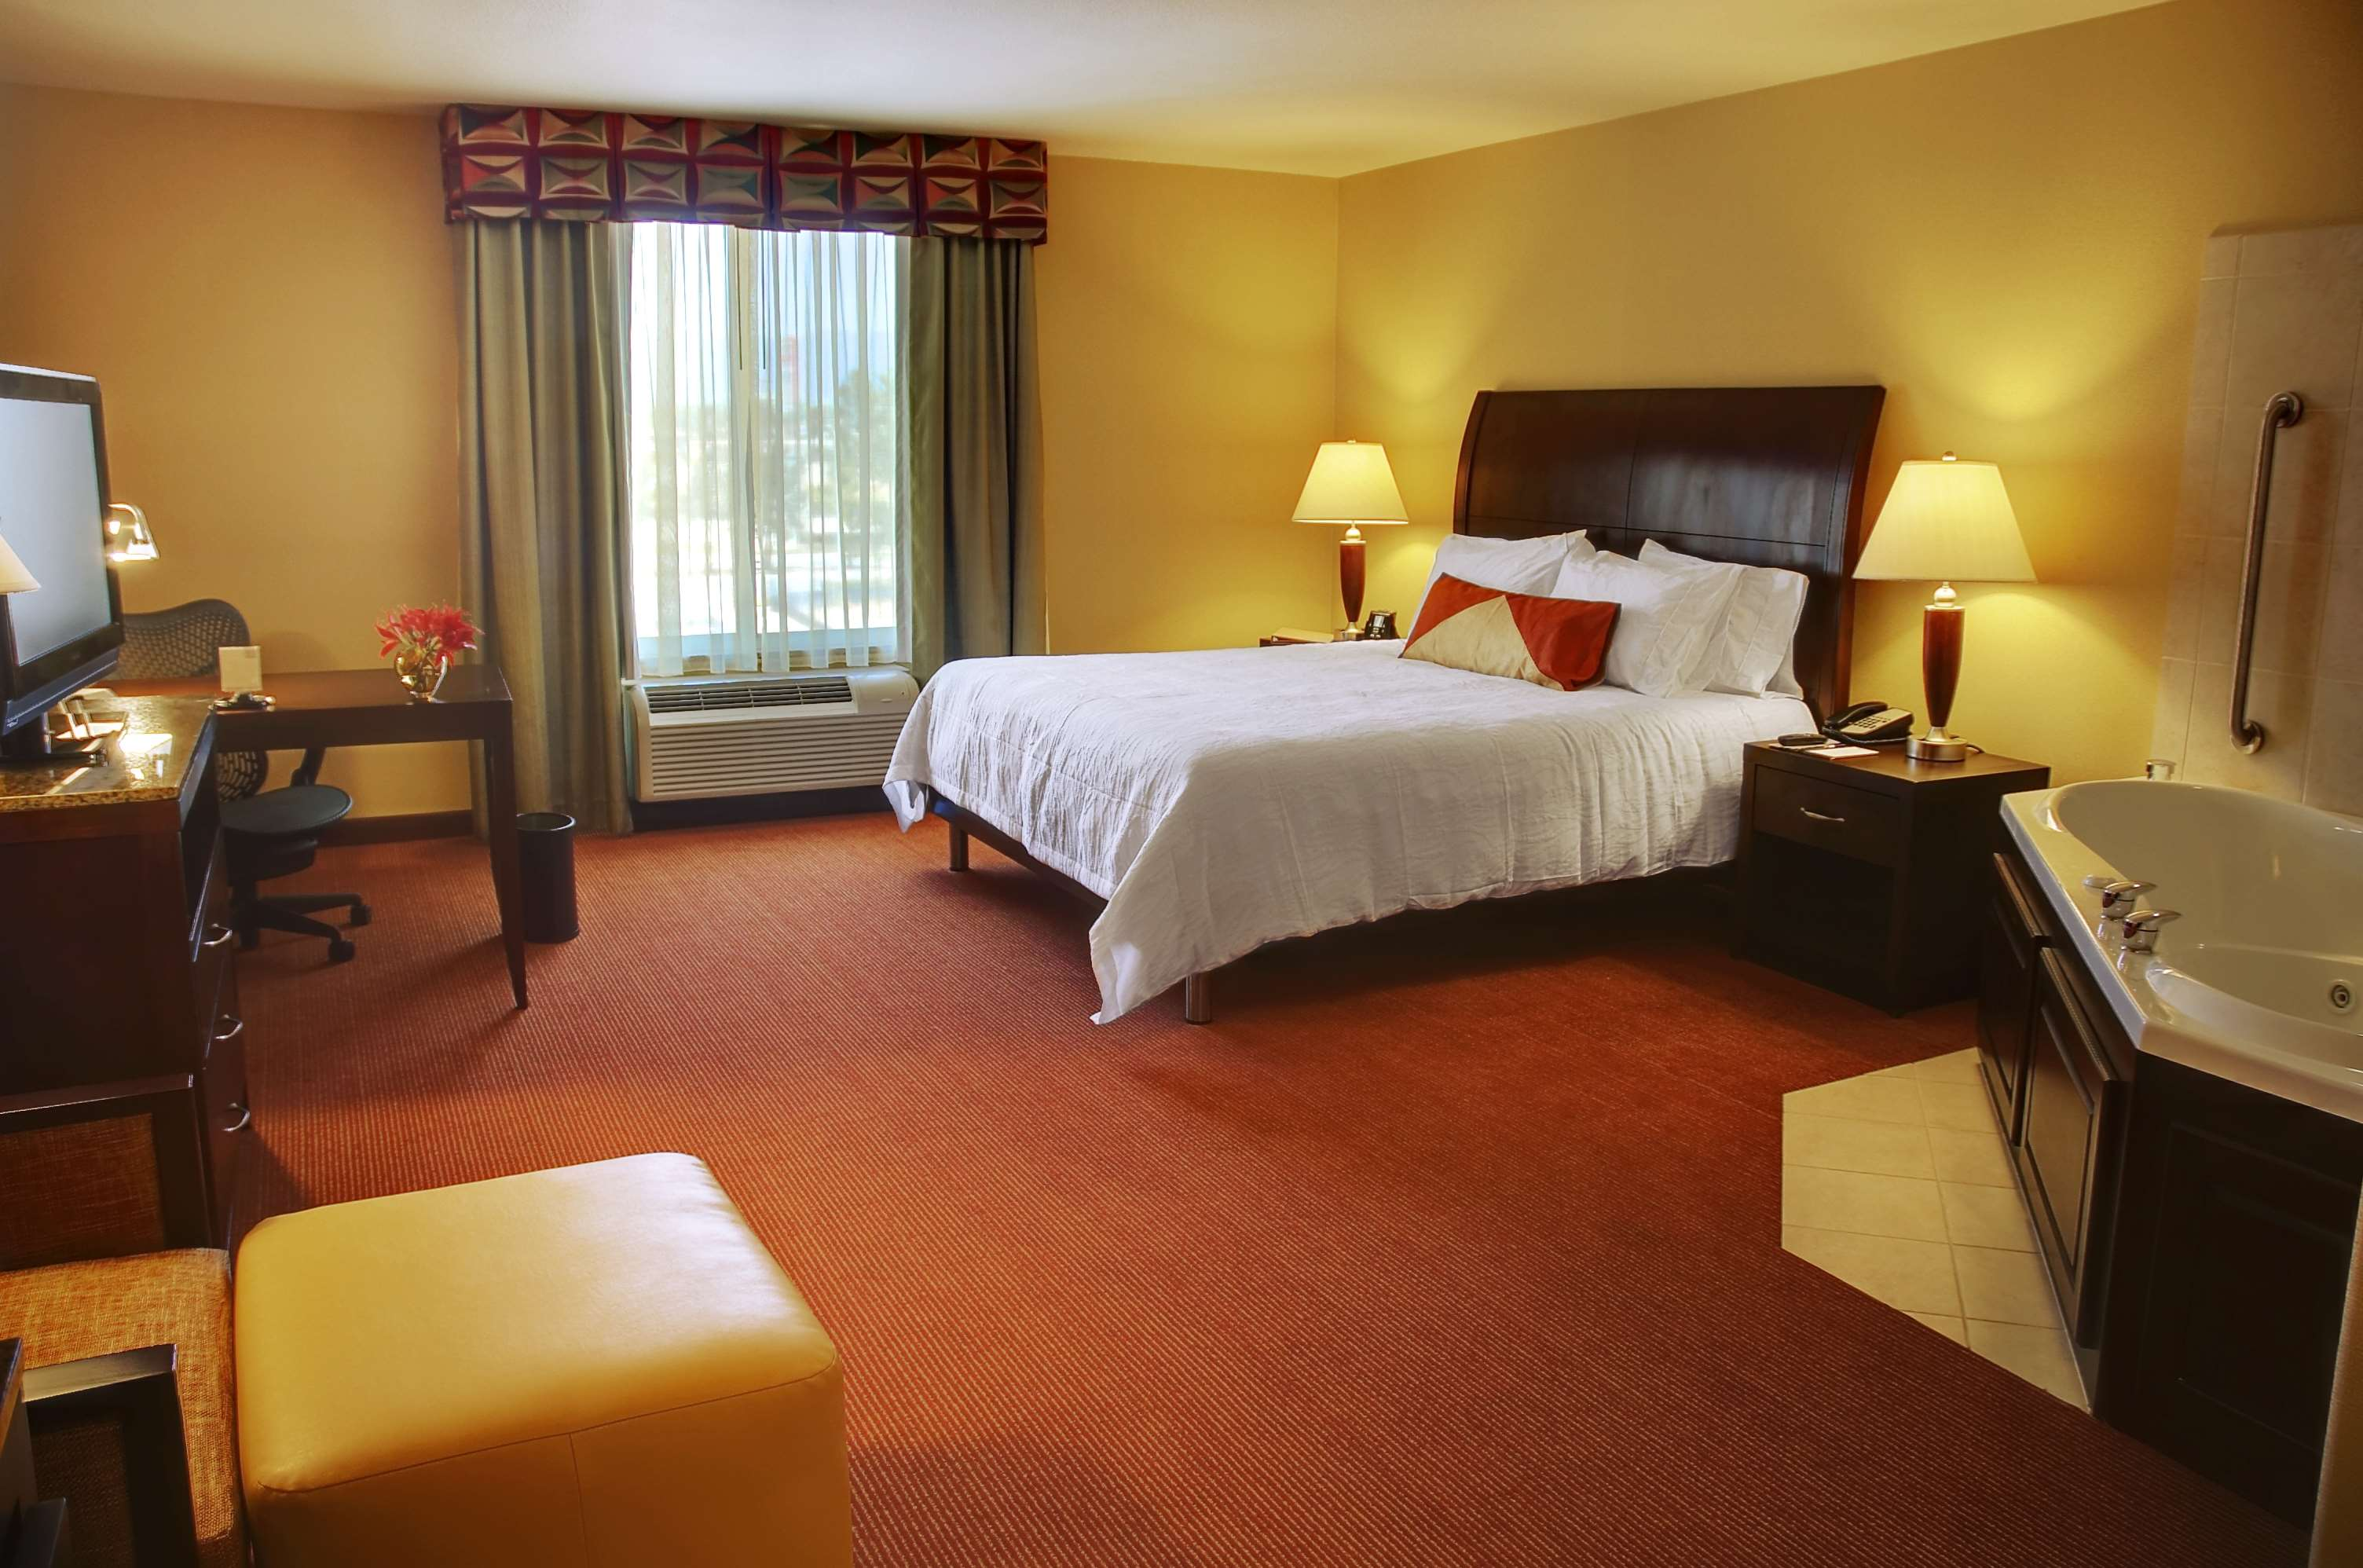 Hilton Garden Inn Fontana image 5